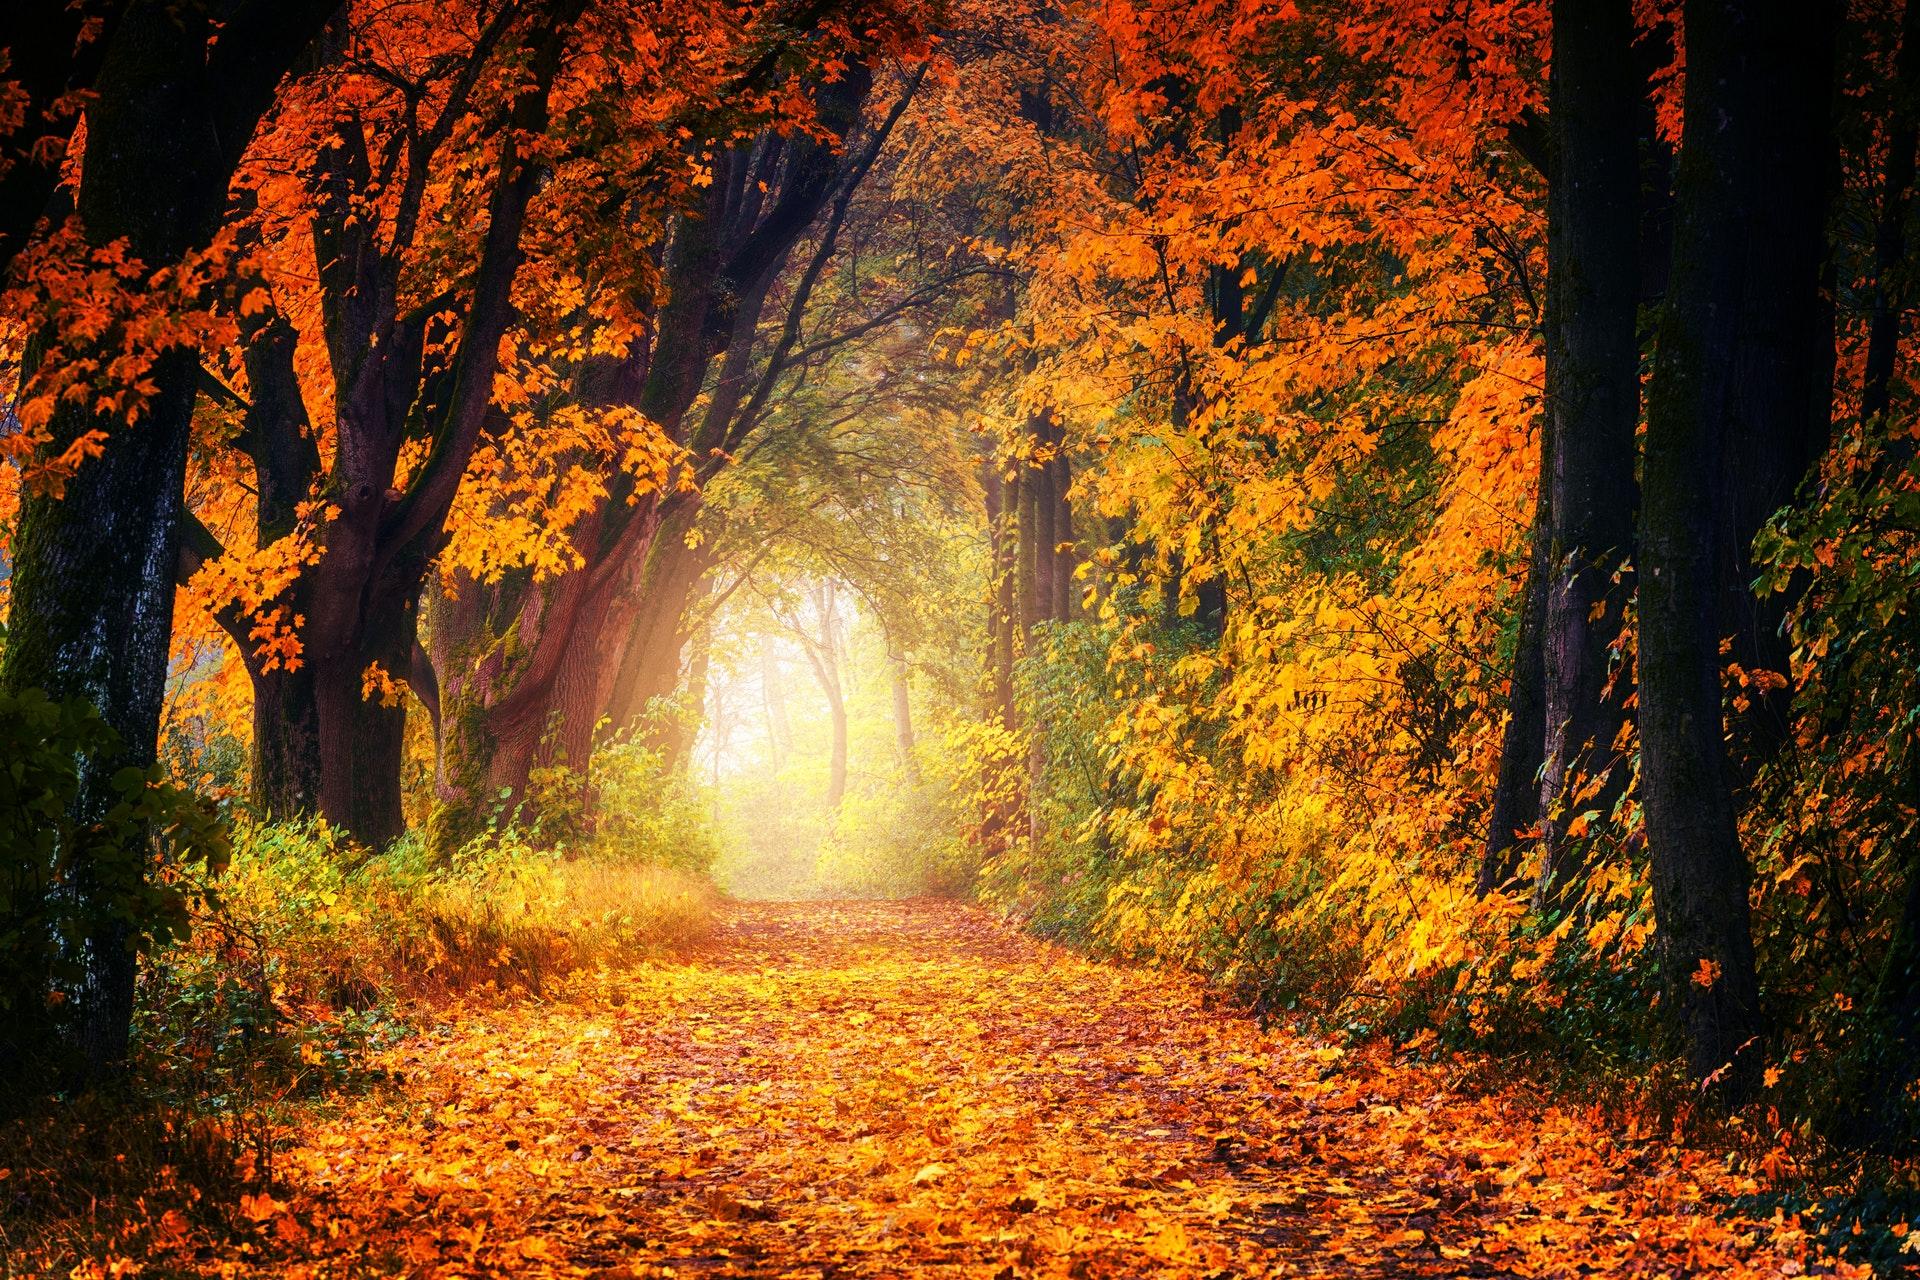 Heavenly Hygge Retreat - November 7th - 11th